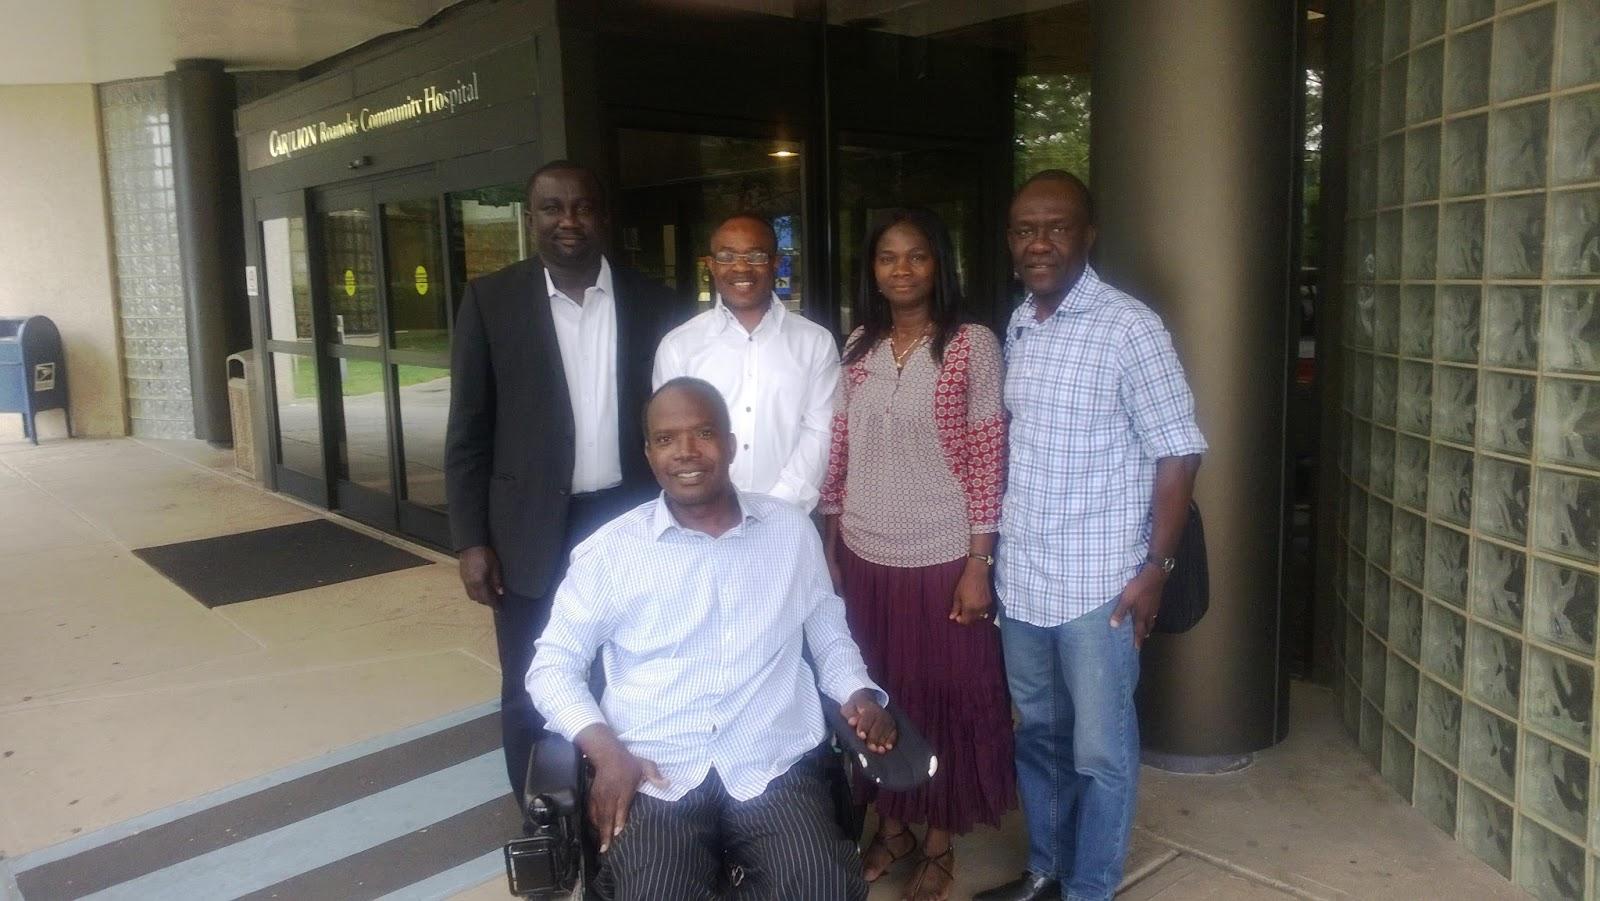 Koduah, Mrs Martha Ntumy and Pastor Jonnie Ansah behind me. Pastor ...